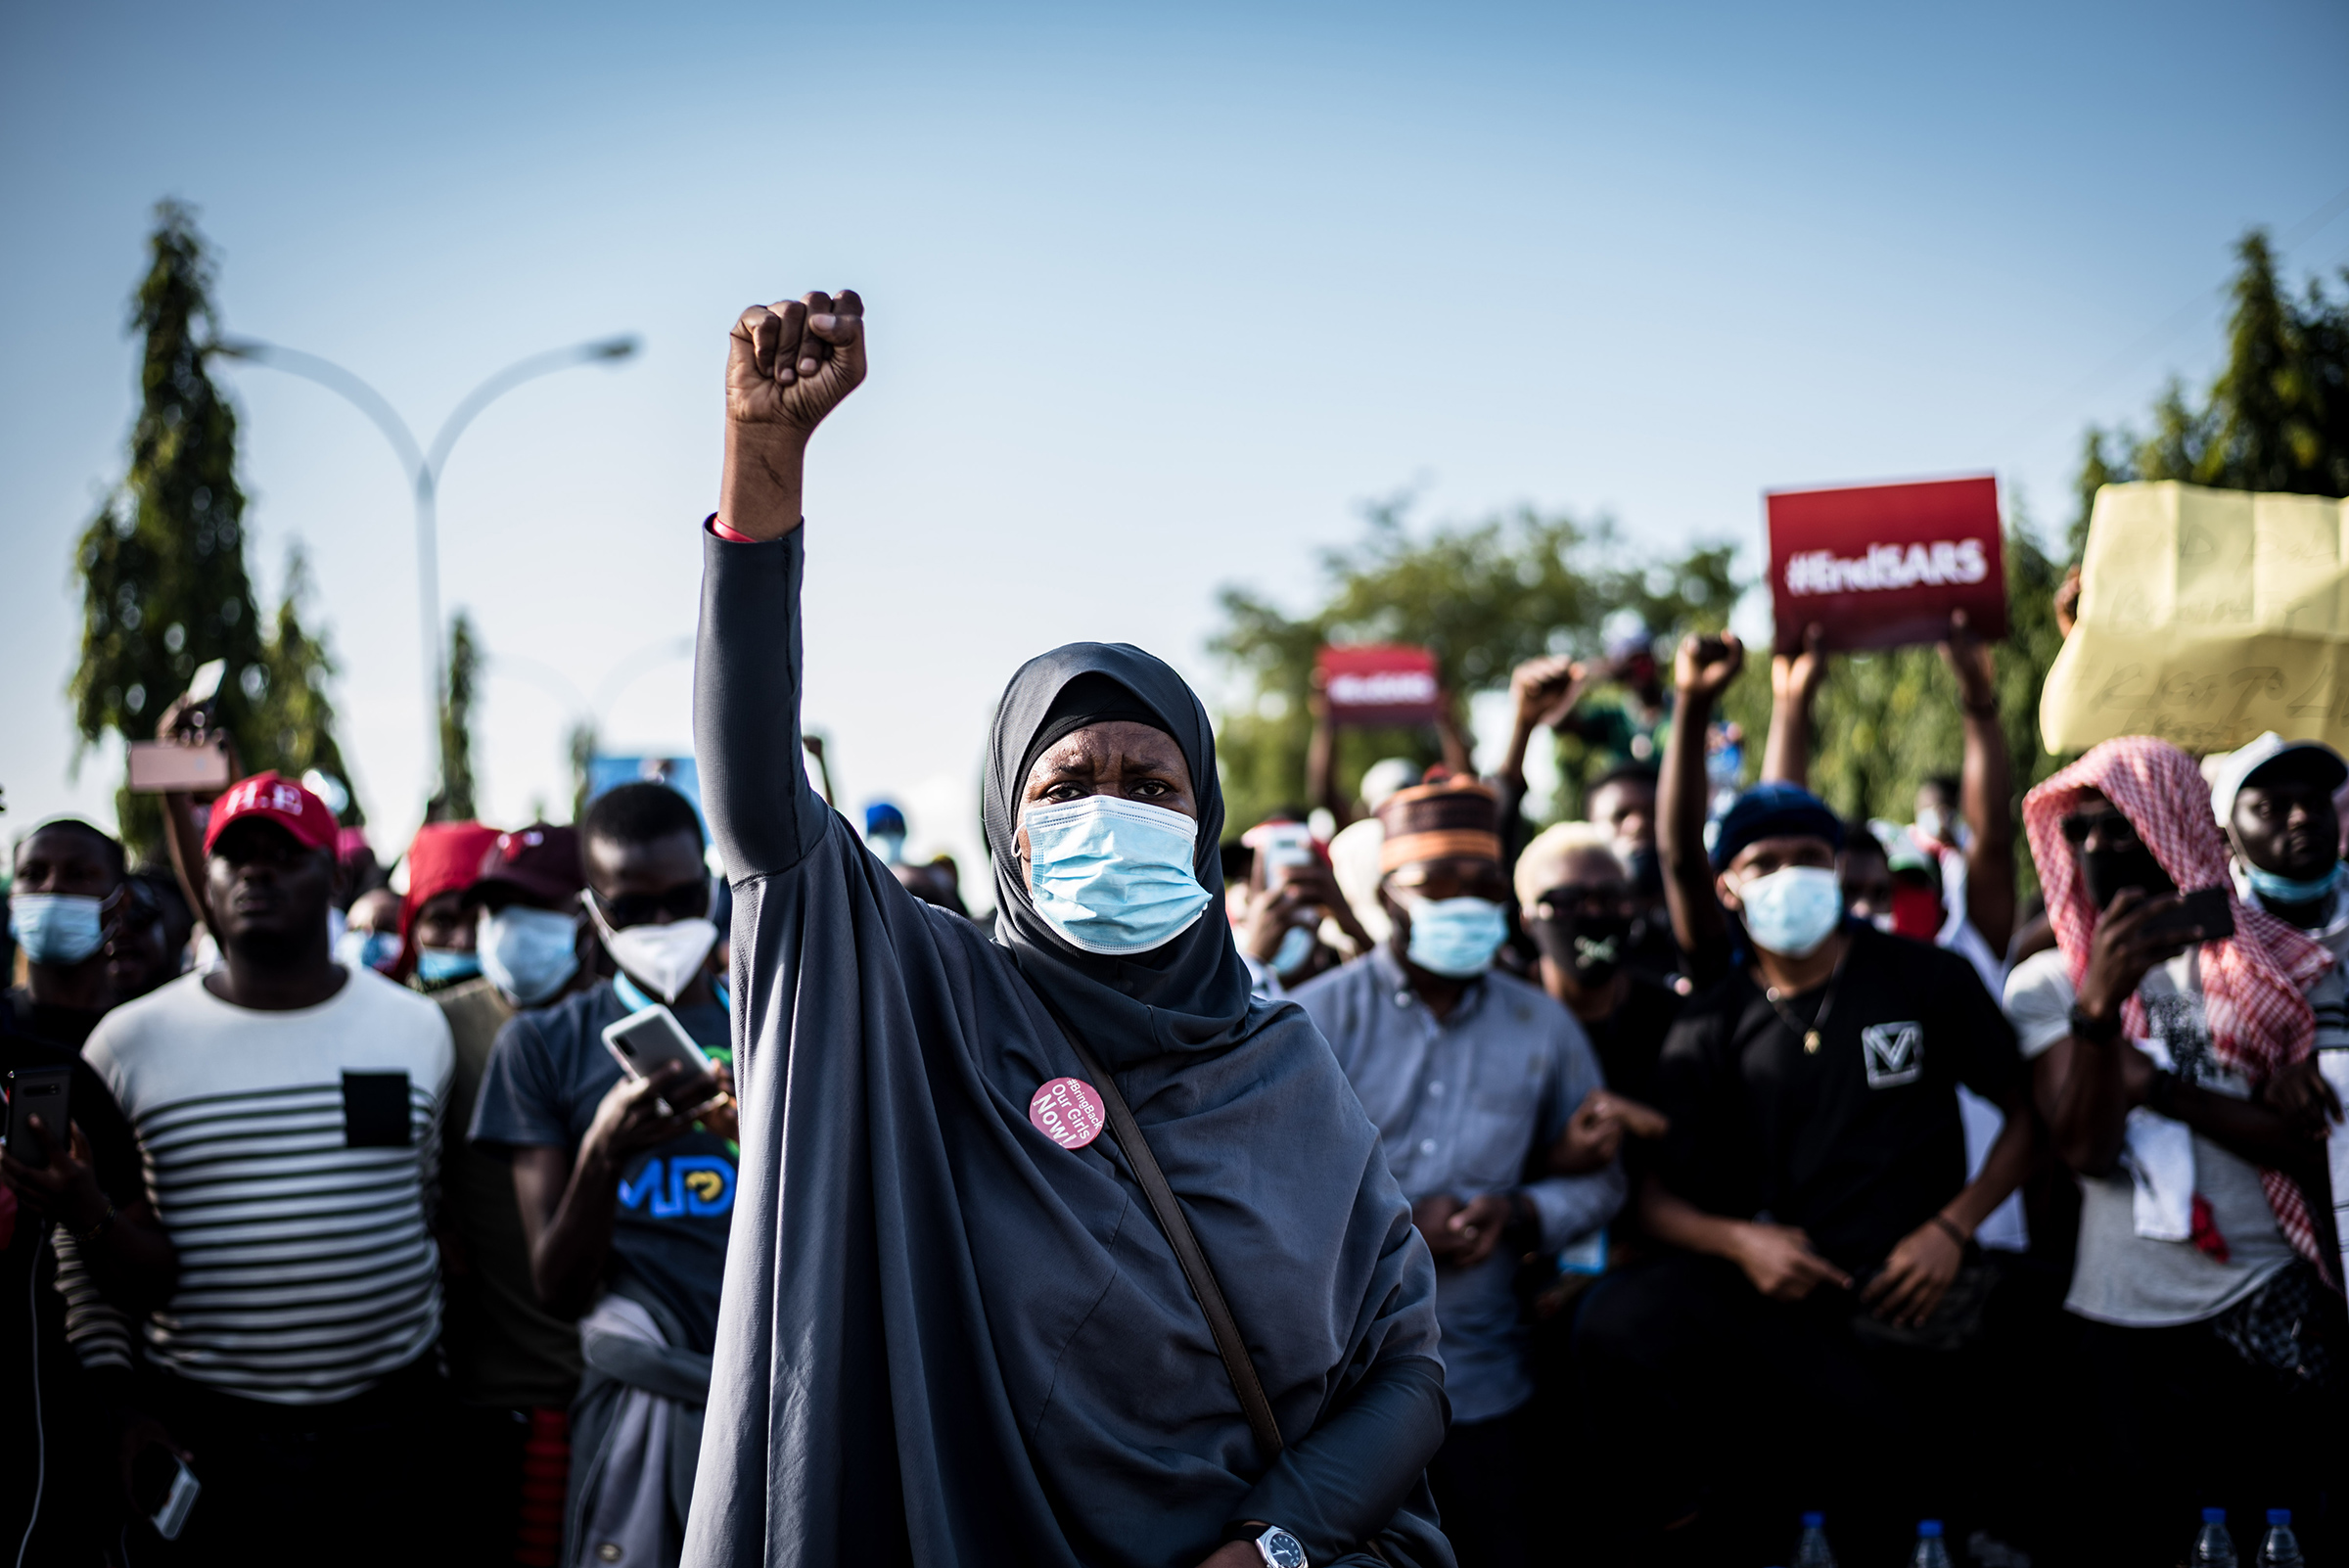 https://api.time.com/wp-content/uploads/2020/10/etinosa-yvonne-aisha-yesufu-nigeria-endsars-protests.jpg?quality=85